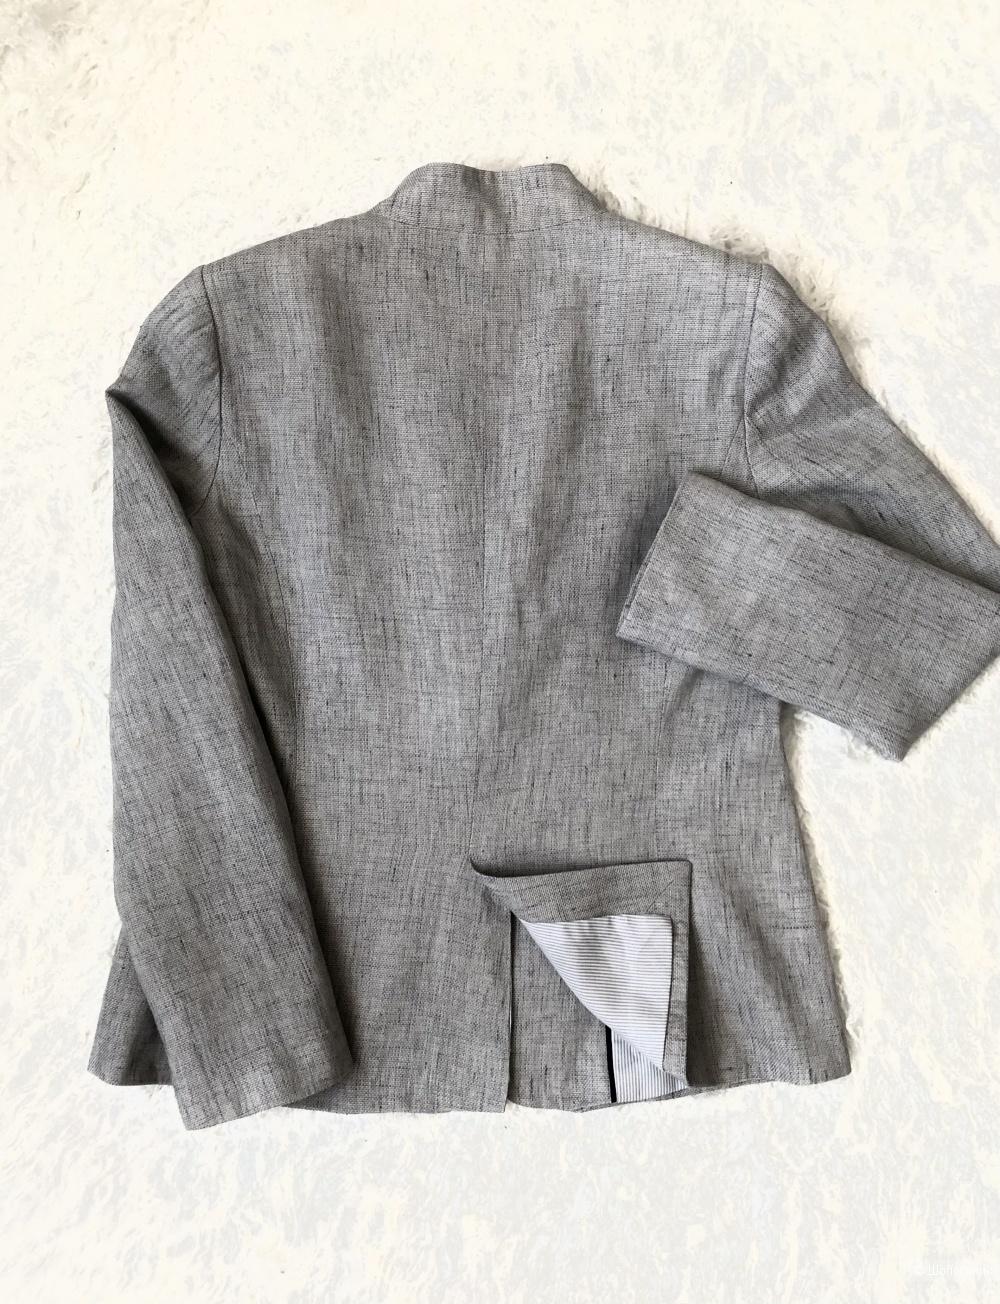 Пиджак Massimo Dutti,M(44) размер.